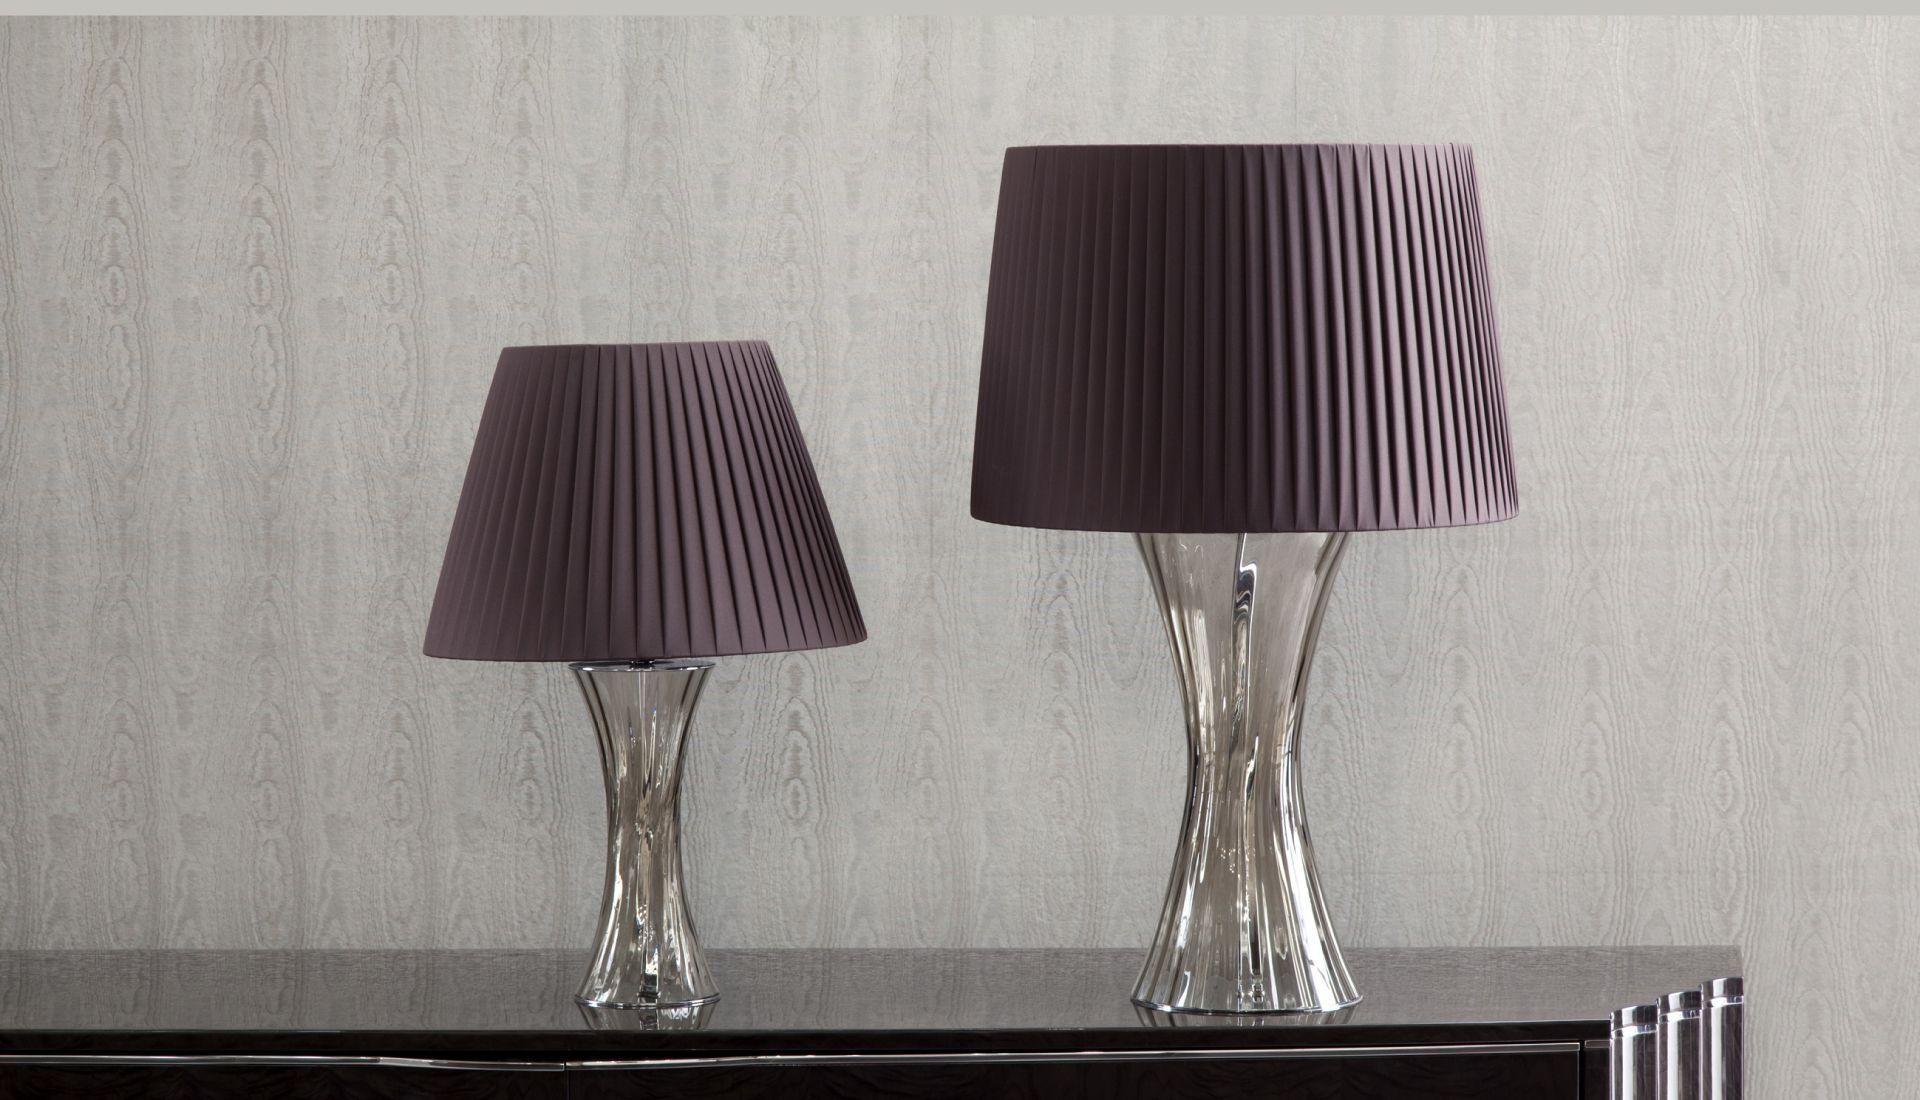 Viyet designer furniture lighting fendi casa tall table lamps - Furniture